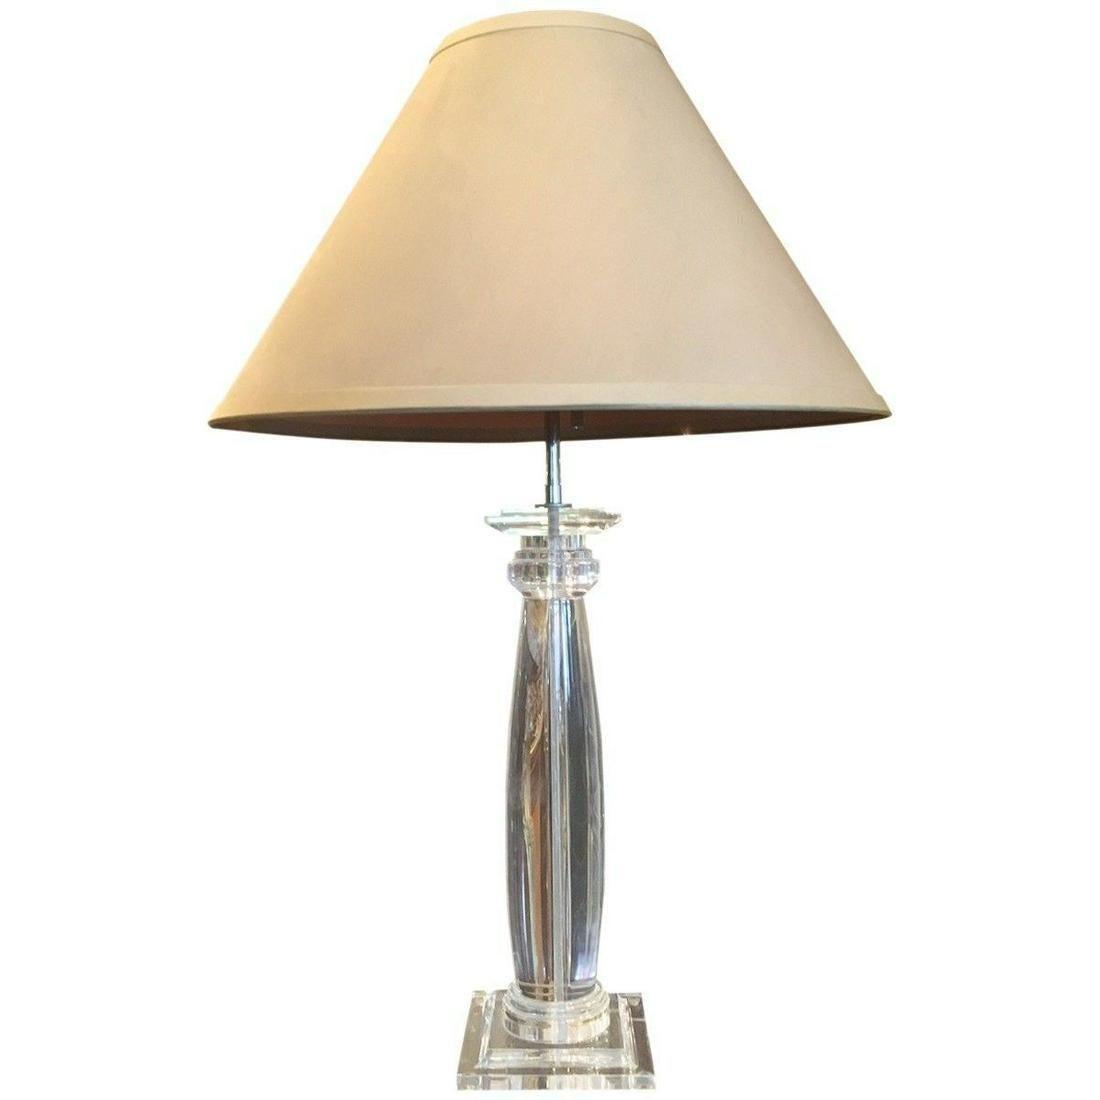 Modern Acrylic Column Table Lamp